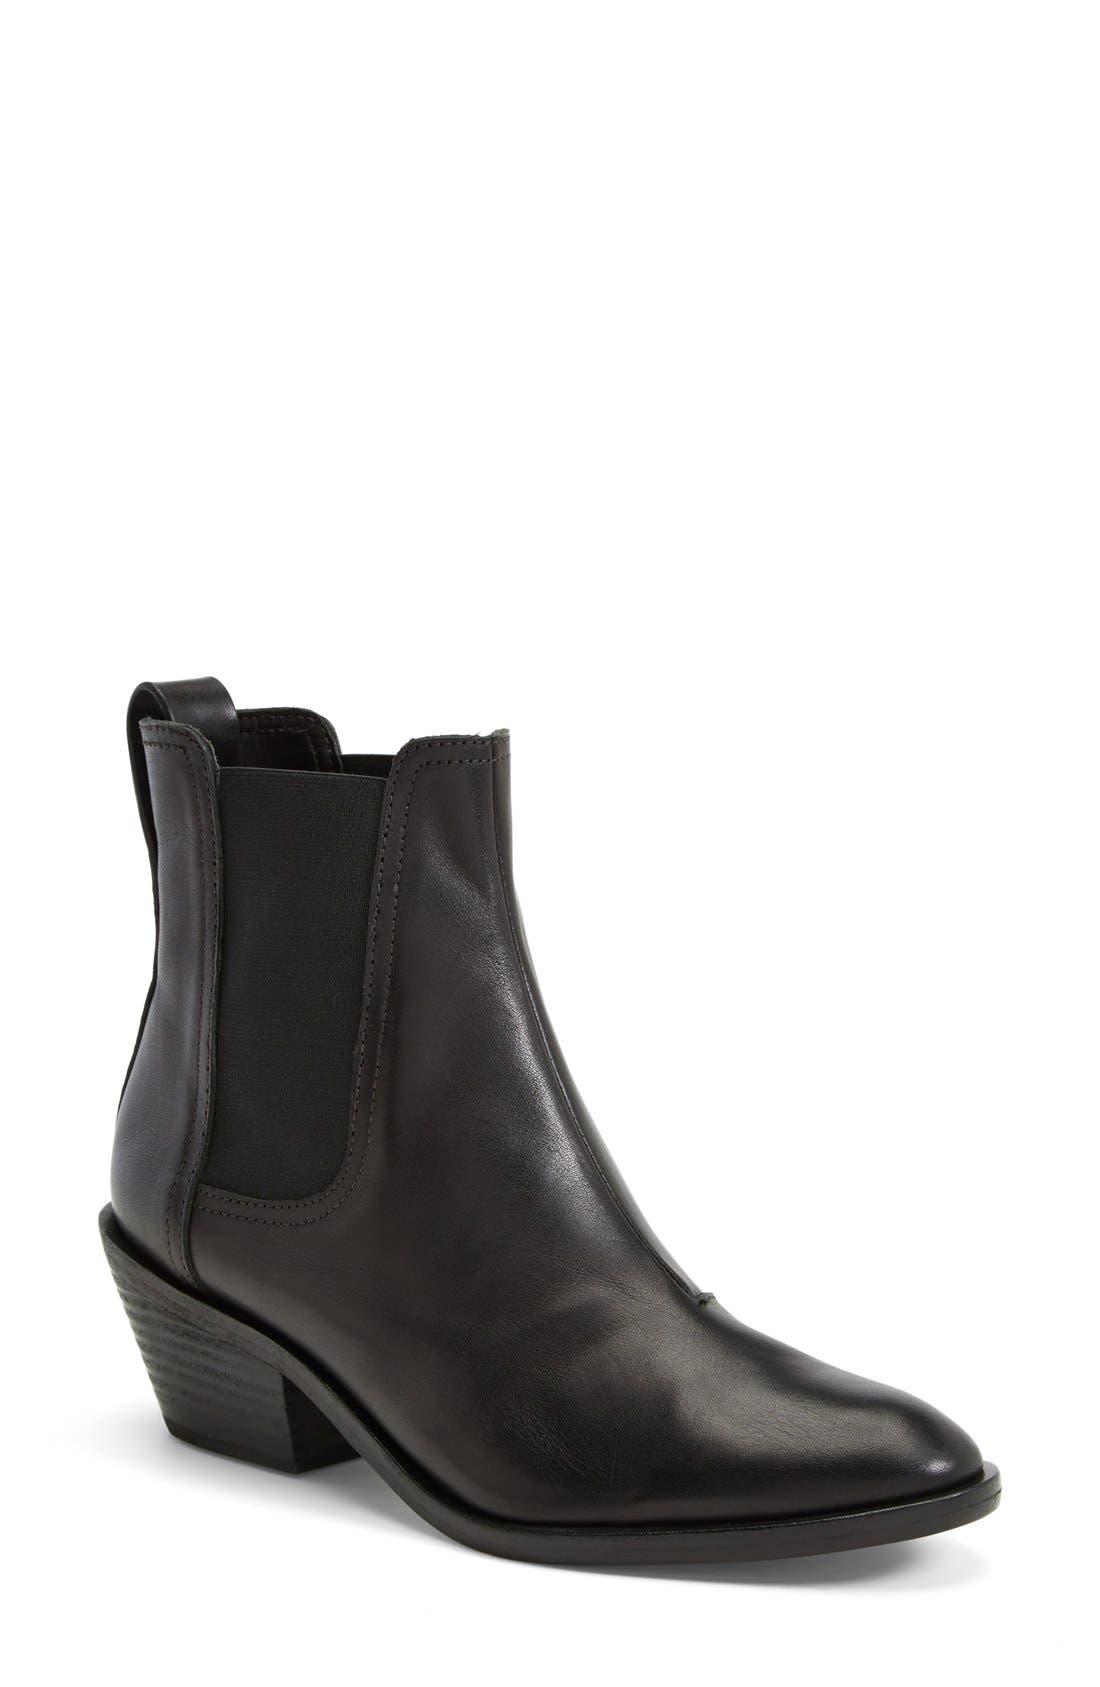 Main Image - rag & bone 'Dixon' Boot (Women)